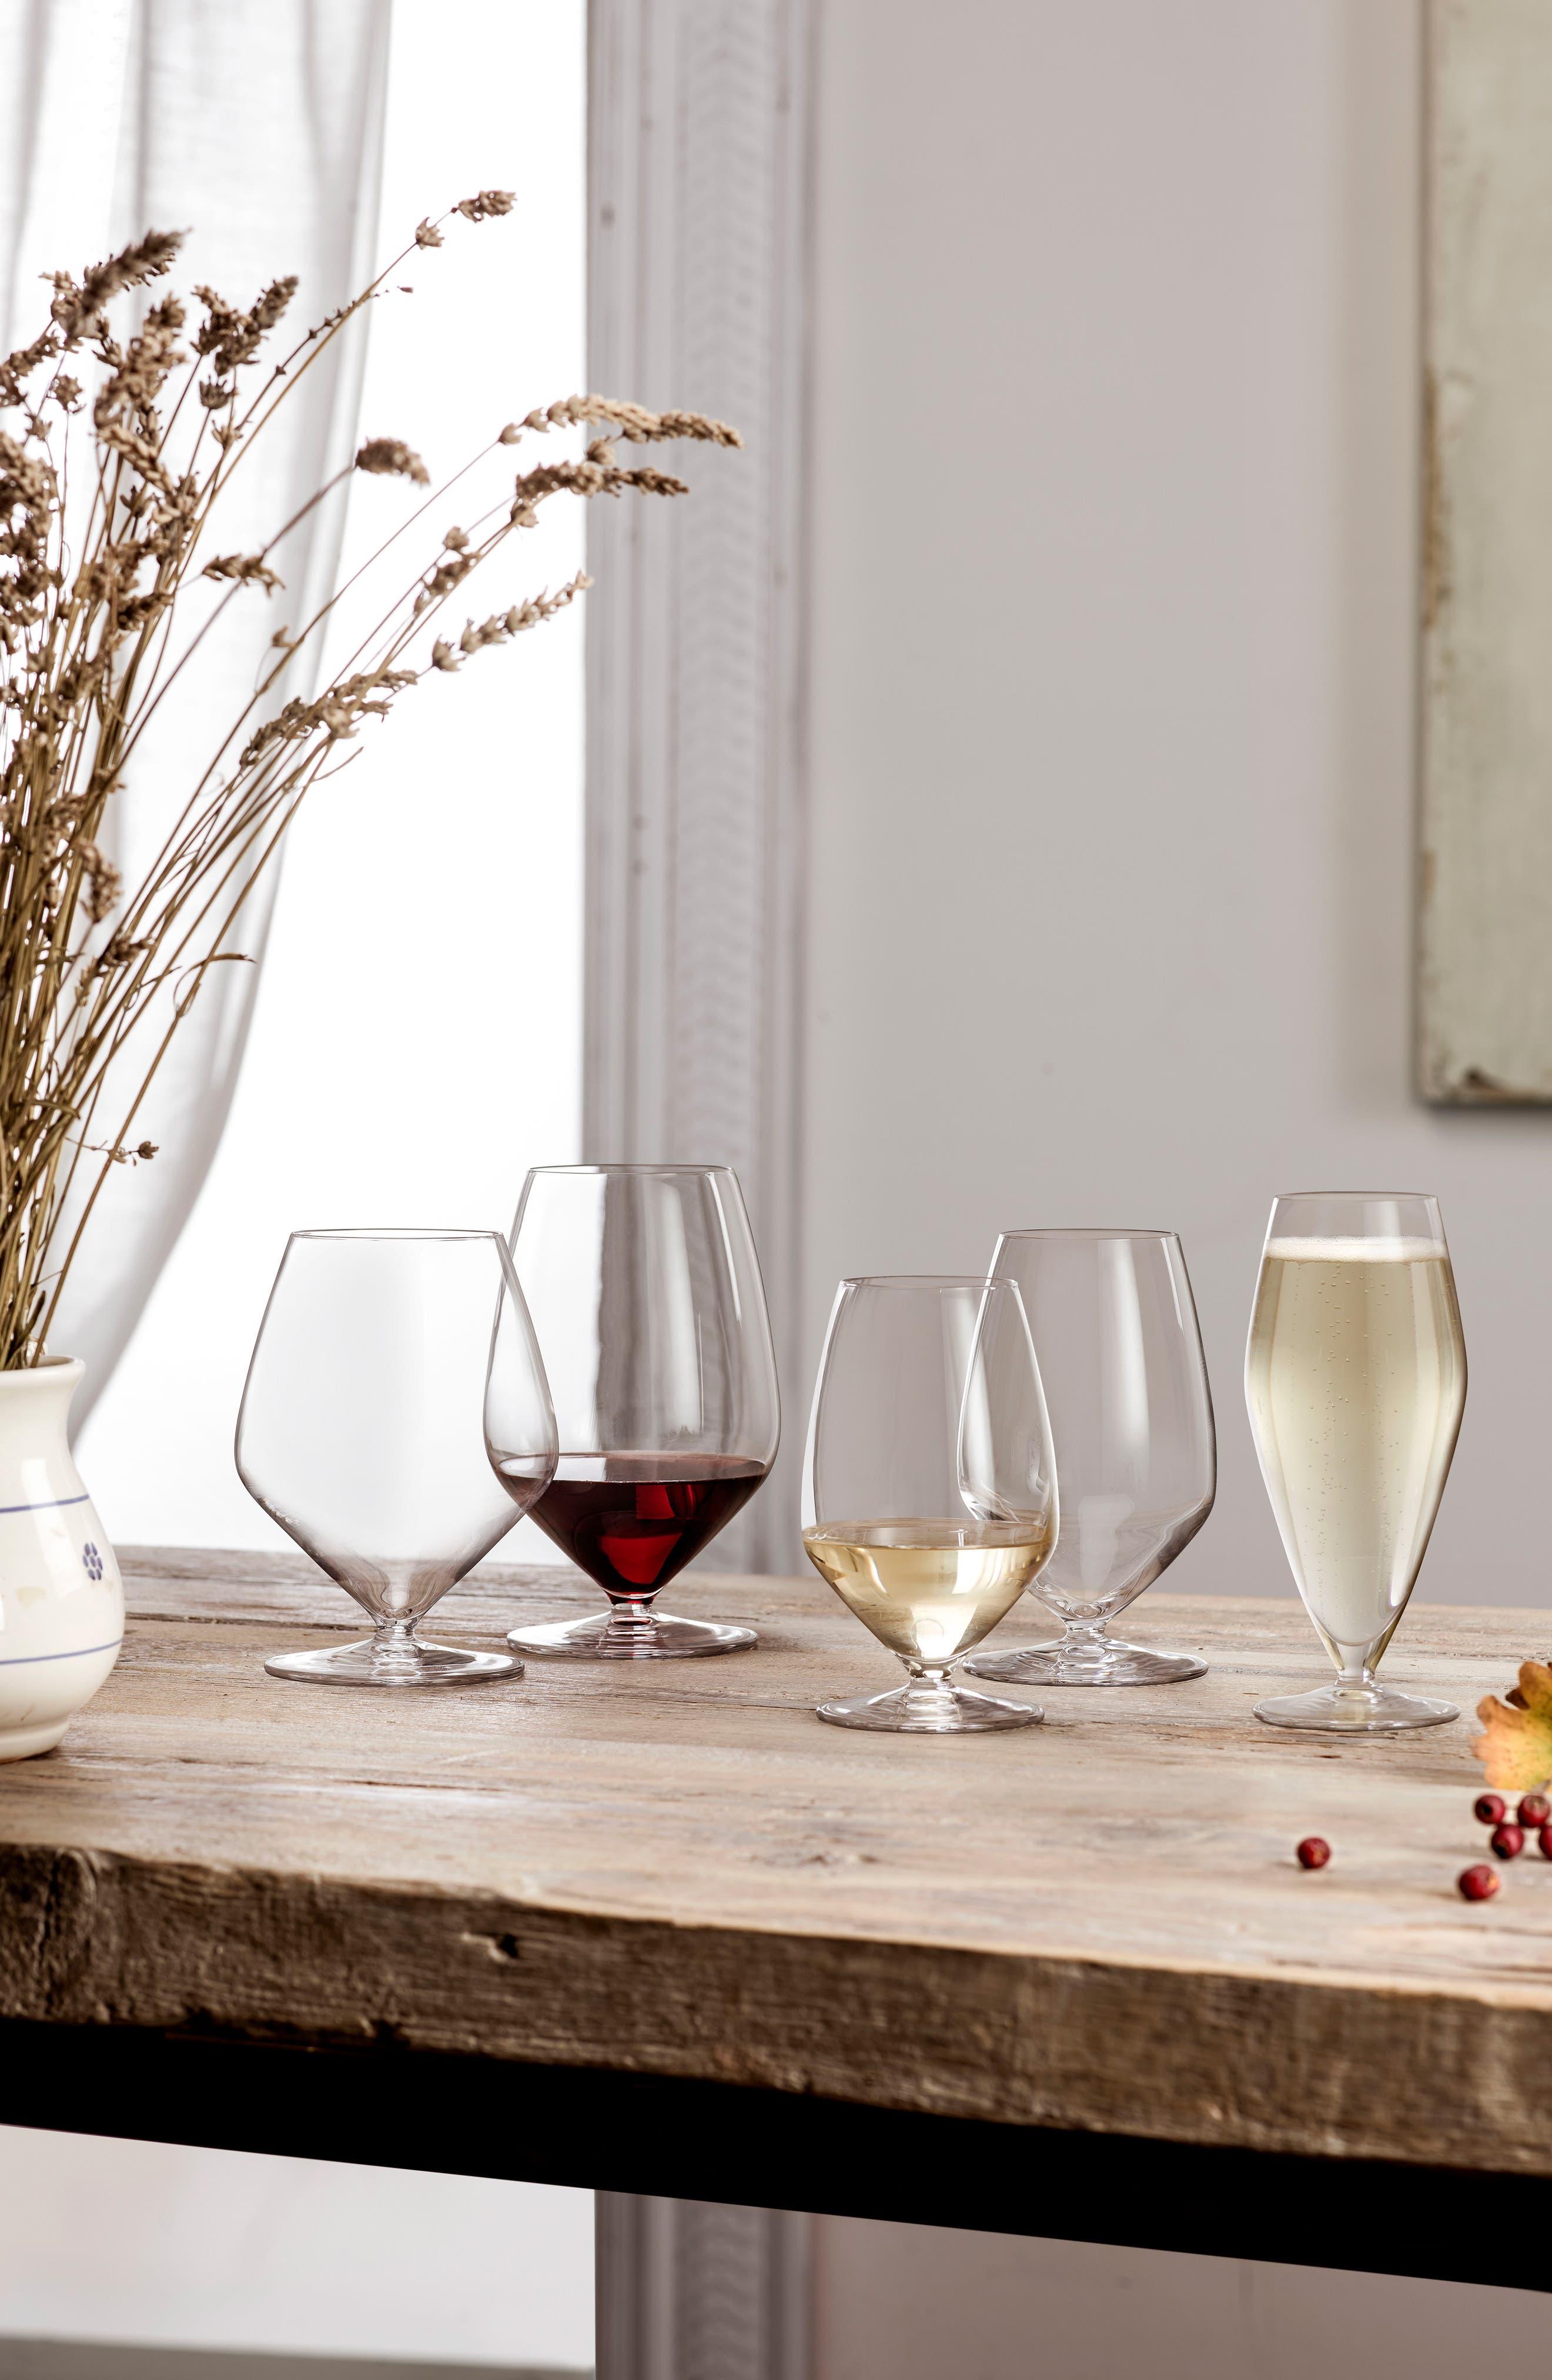 T-Glass Set of 4 Cabernet/Merlot Glasses,                             Alternate thumbnail 2, color,                             Clear